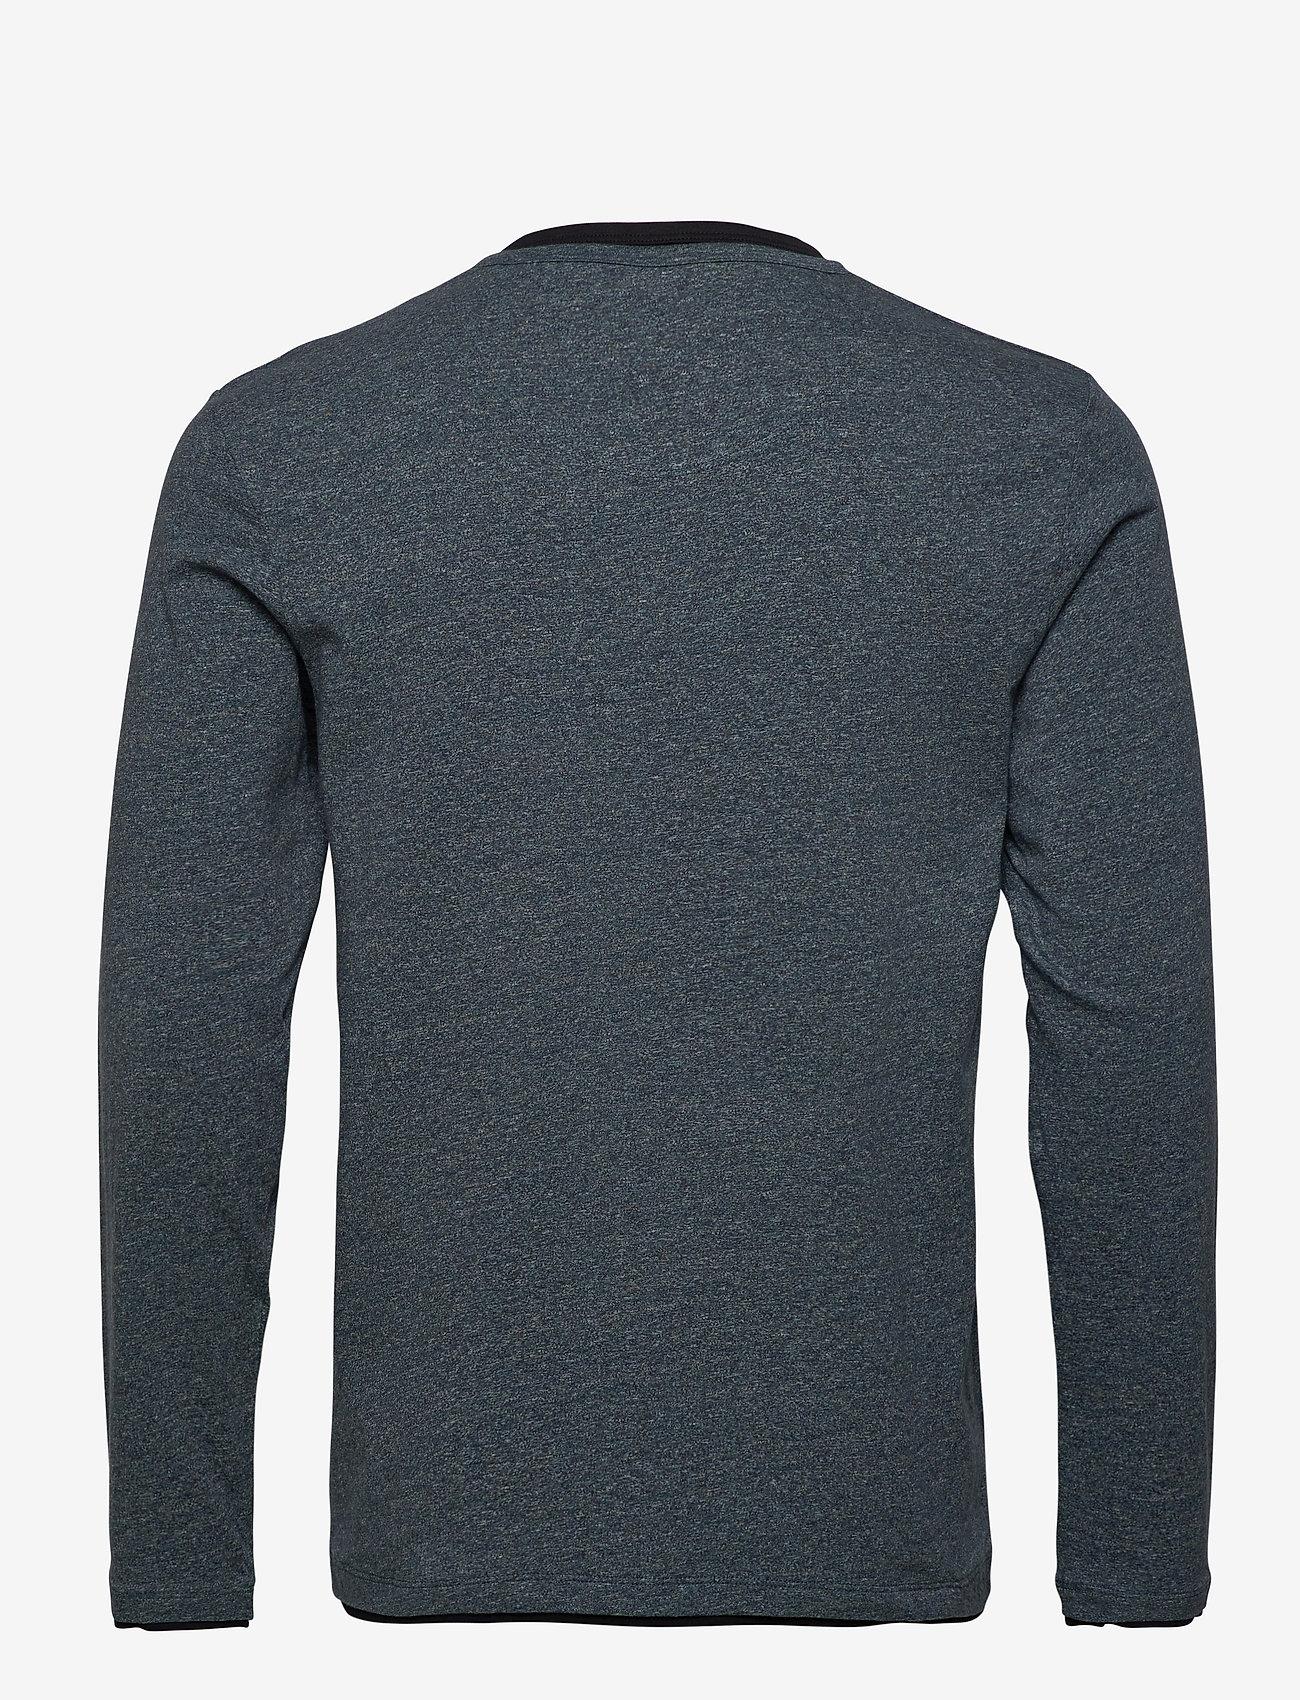 T-shirts (Grey Blue 5) (39.99 €) - Esprit Casual AVYPj